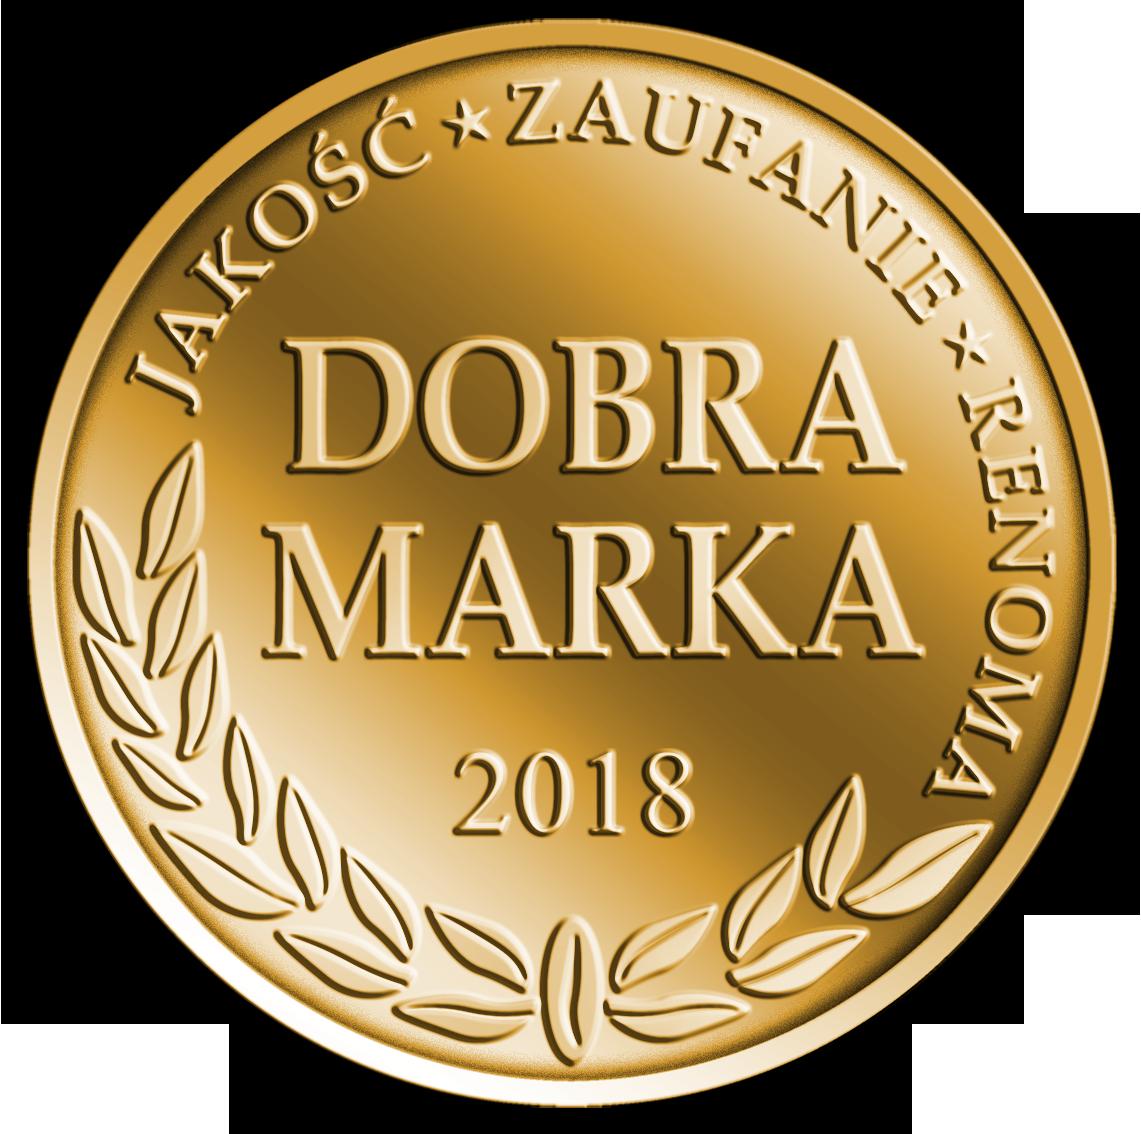 Dobra Marka 2018 logo